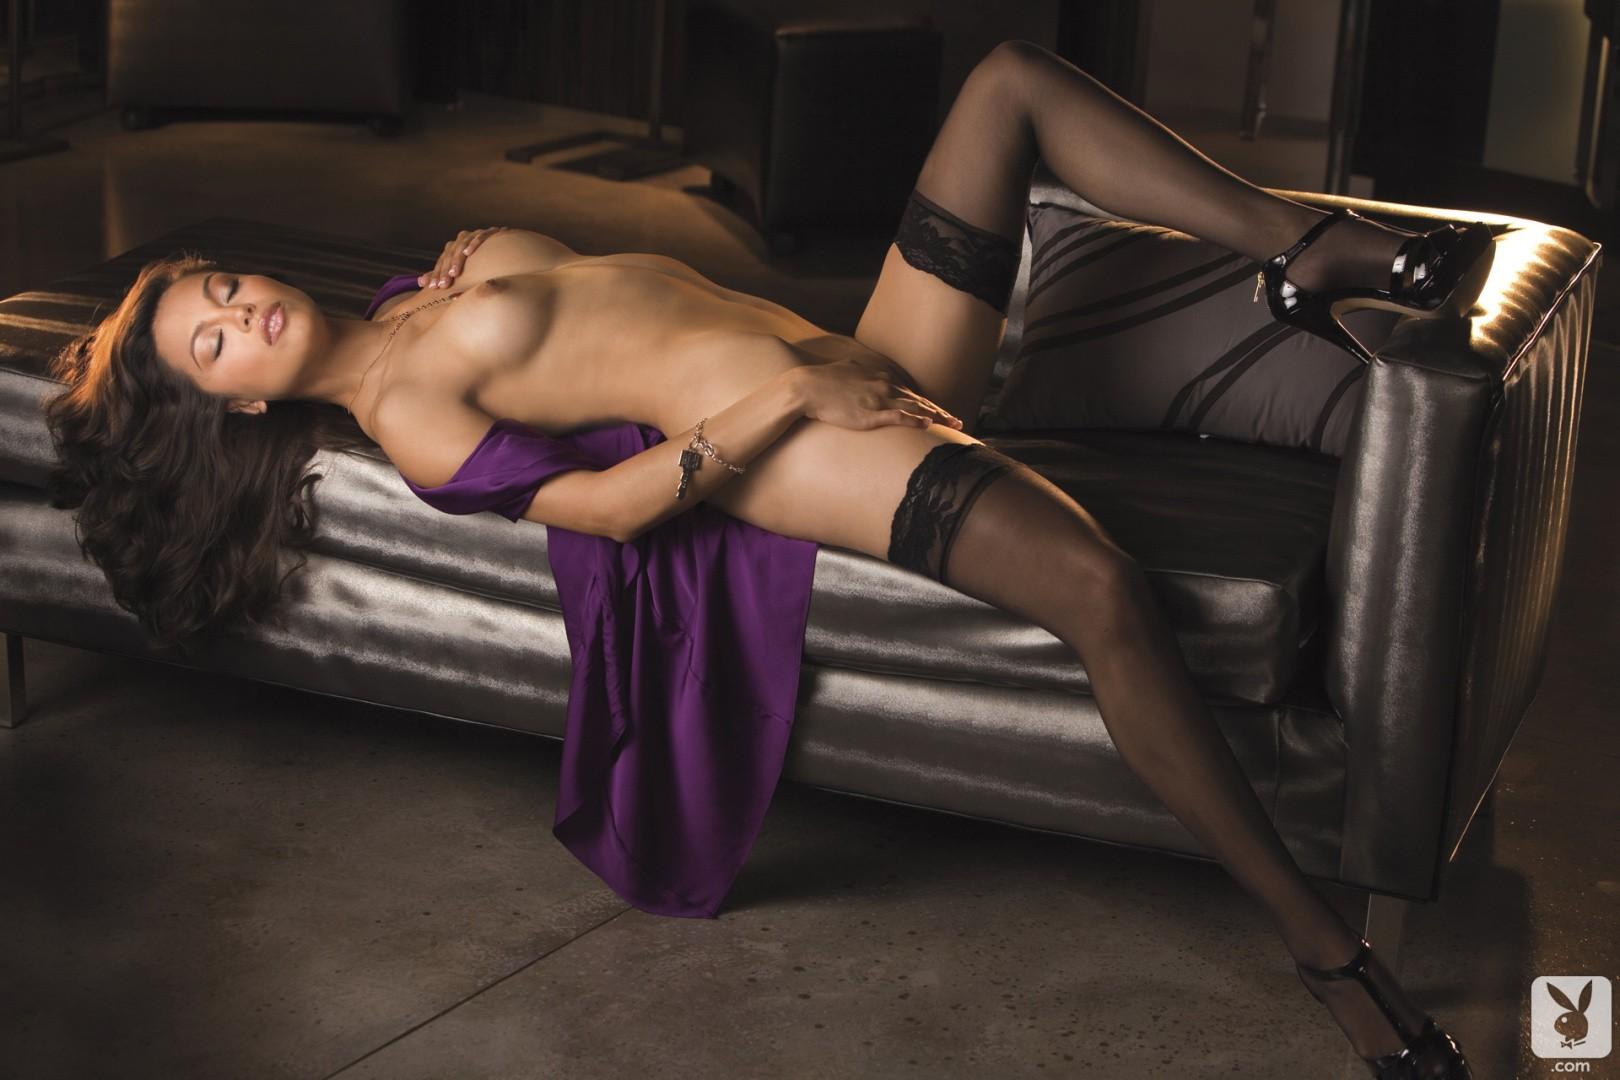 xxx videos de Raquel Pomplun sin ropa interior